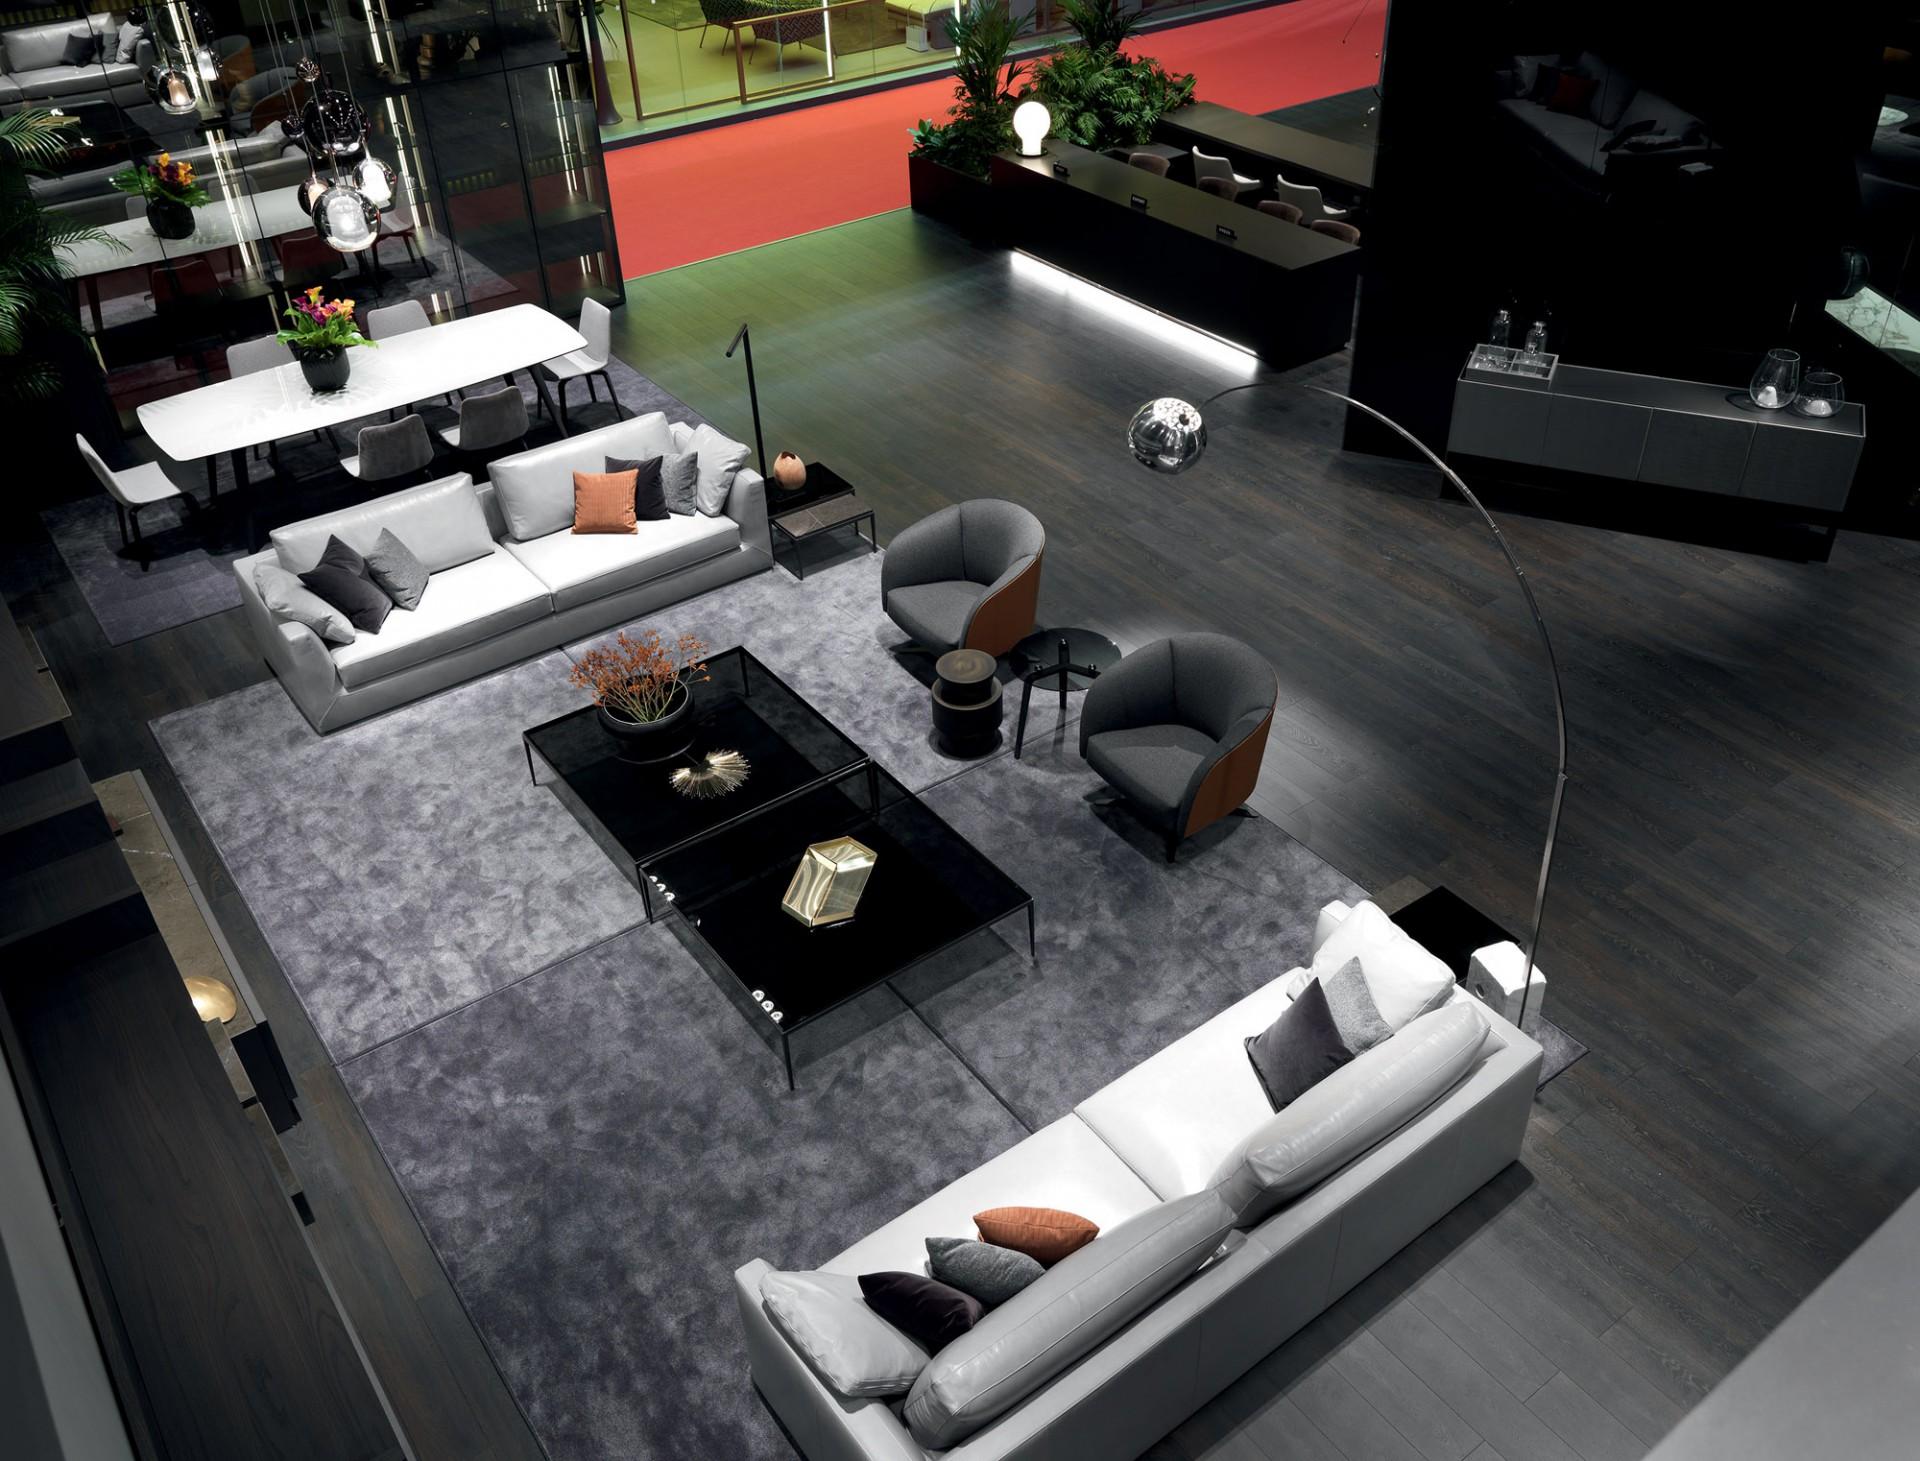 Gallery salone del mobile milan 2017 misuraemme for Milan news mobile